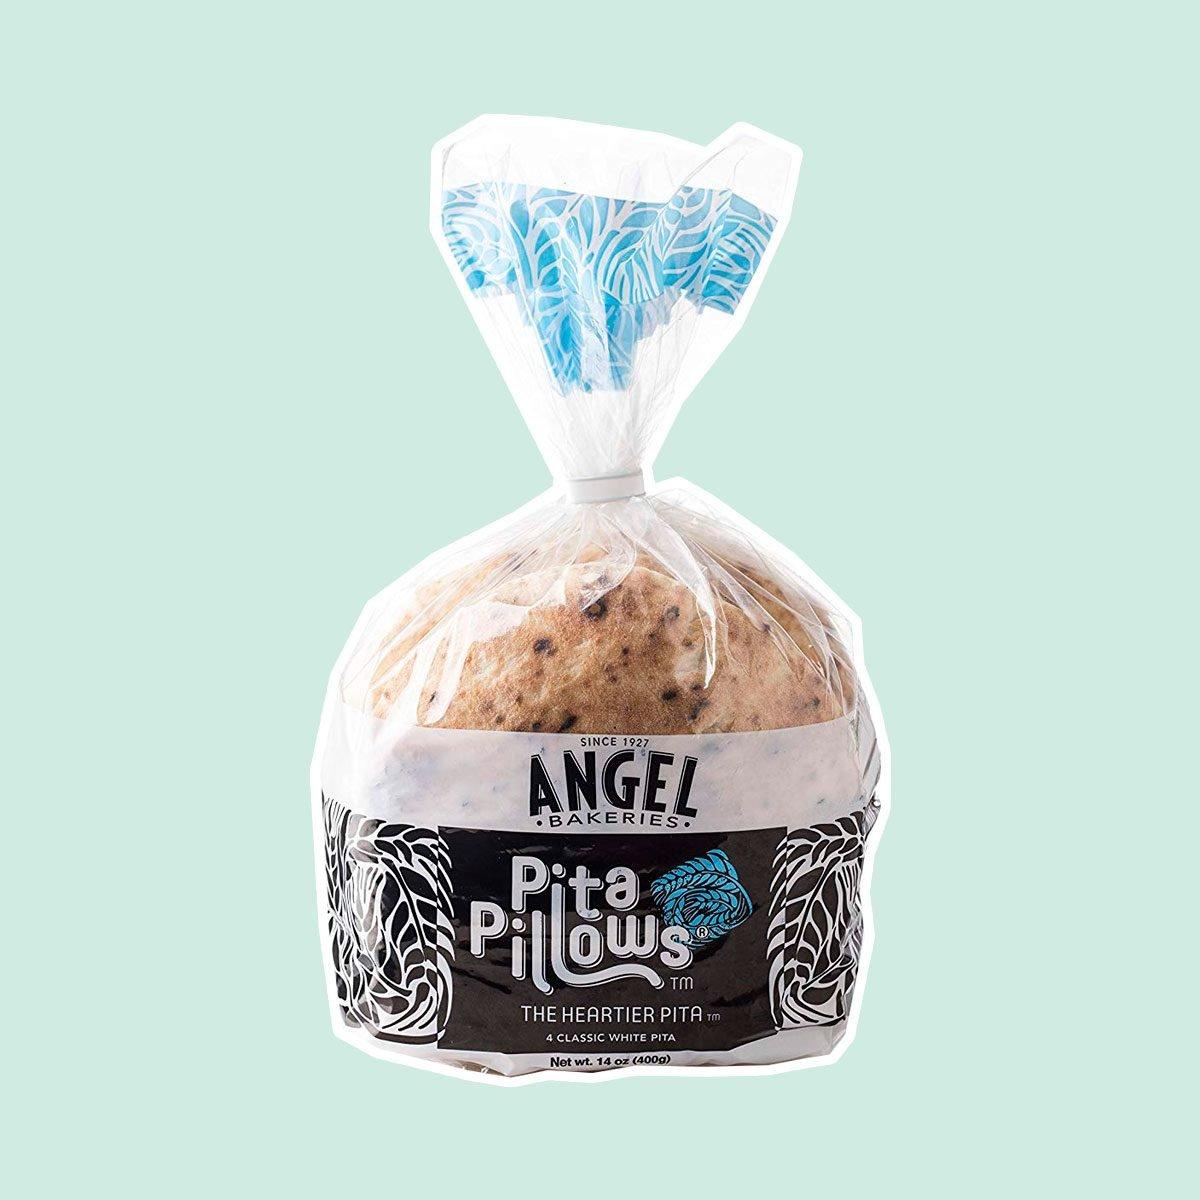 Angel's Bakery Classic White Pita Pillows